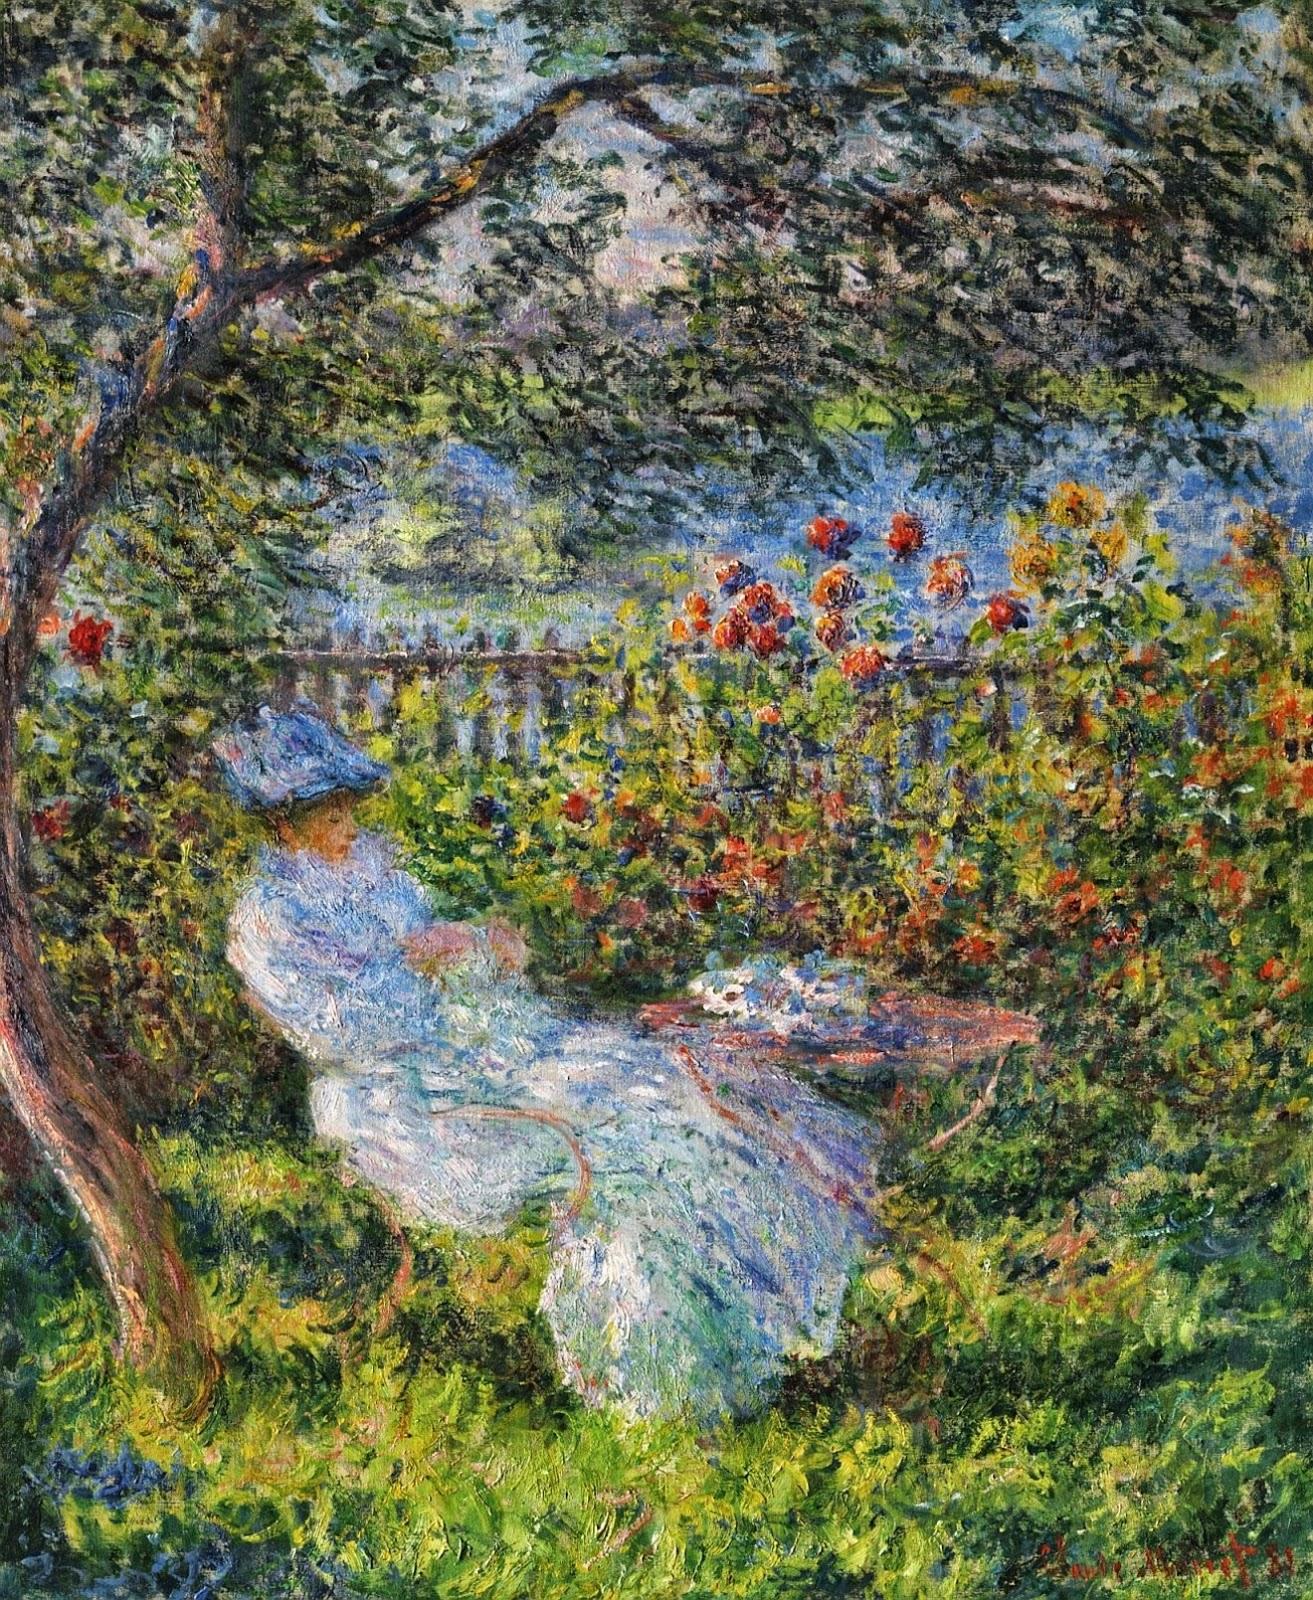 ������ < ����� ����� � ���� >:: ���� ����, �������� ������� - ���� ���� (Claude Monet) ����